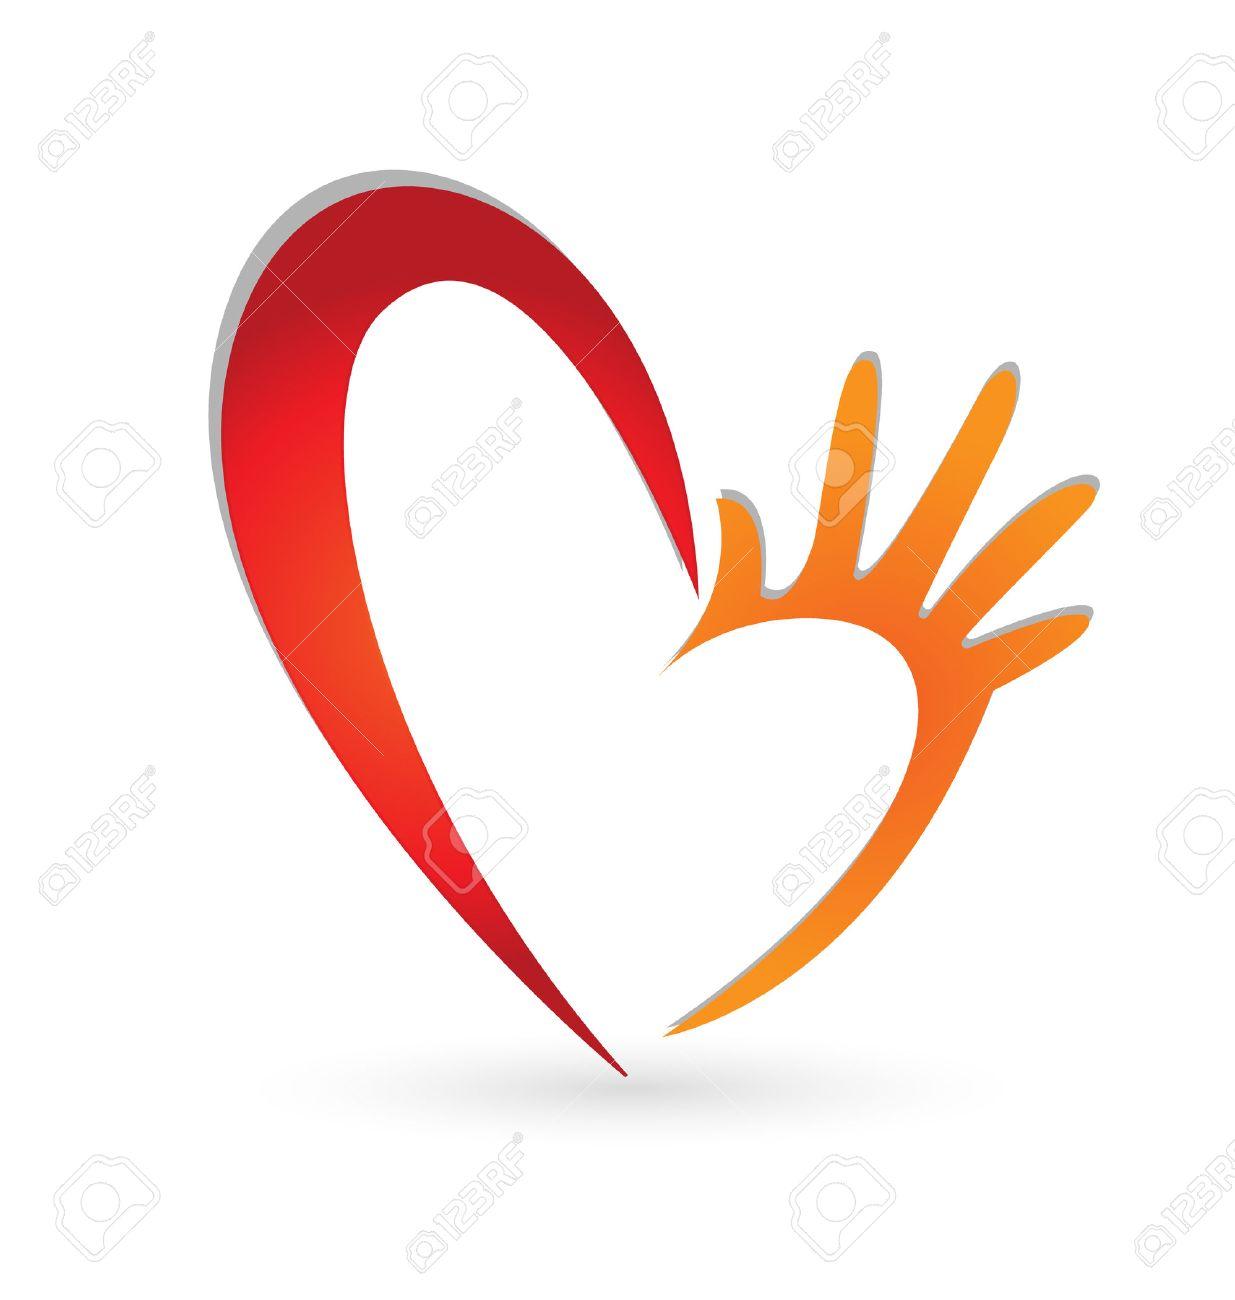 Heart Heart Hands Icon